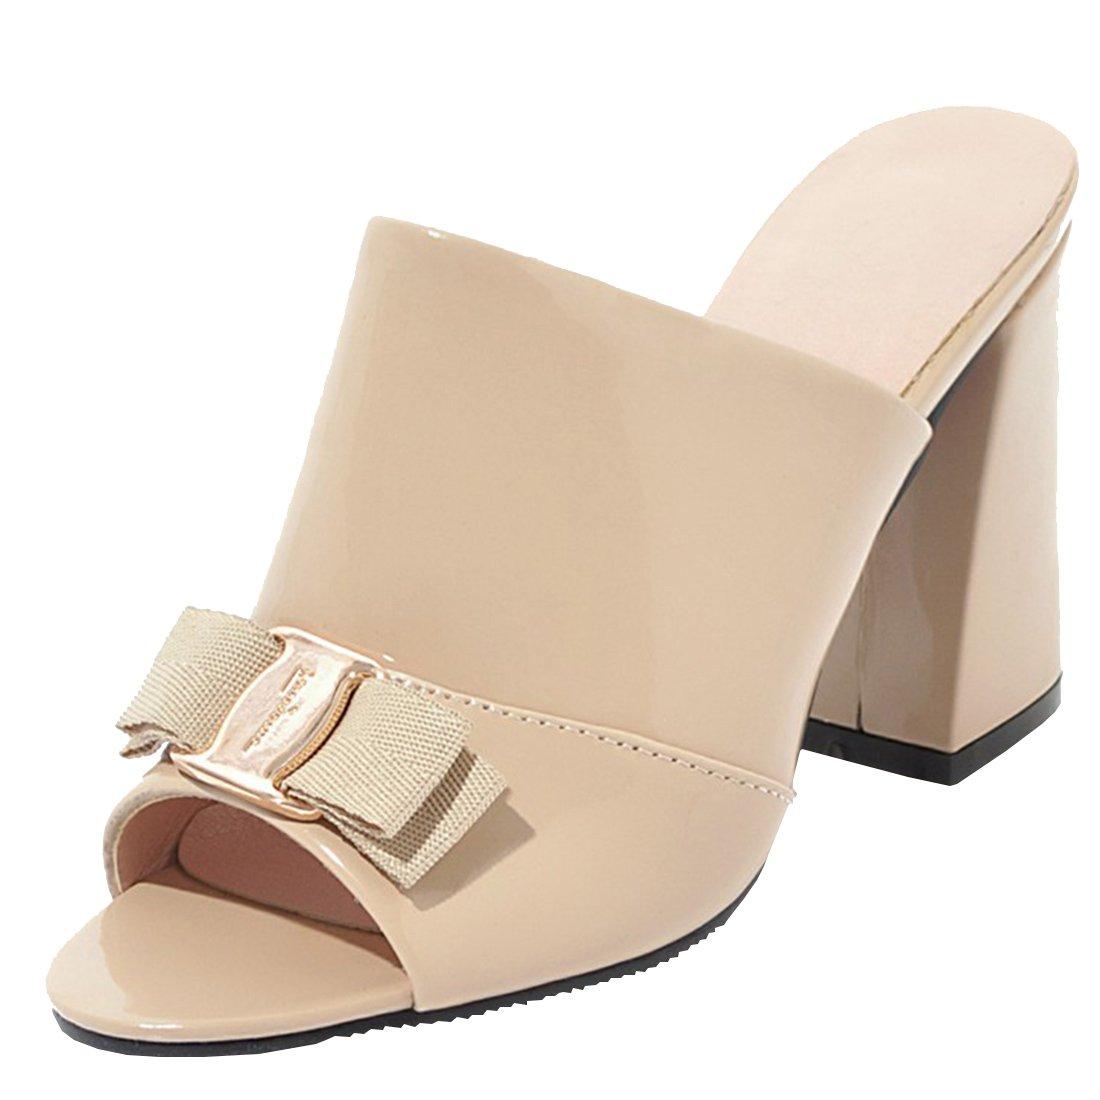 UH Damen Chunky Heel Pantoletten Peep Toe Slingback Slipper mit Schleife Metall Blockabsatz Schuhe